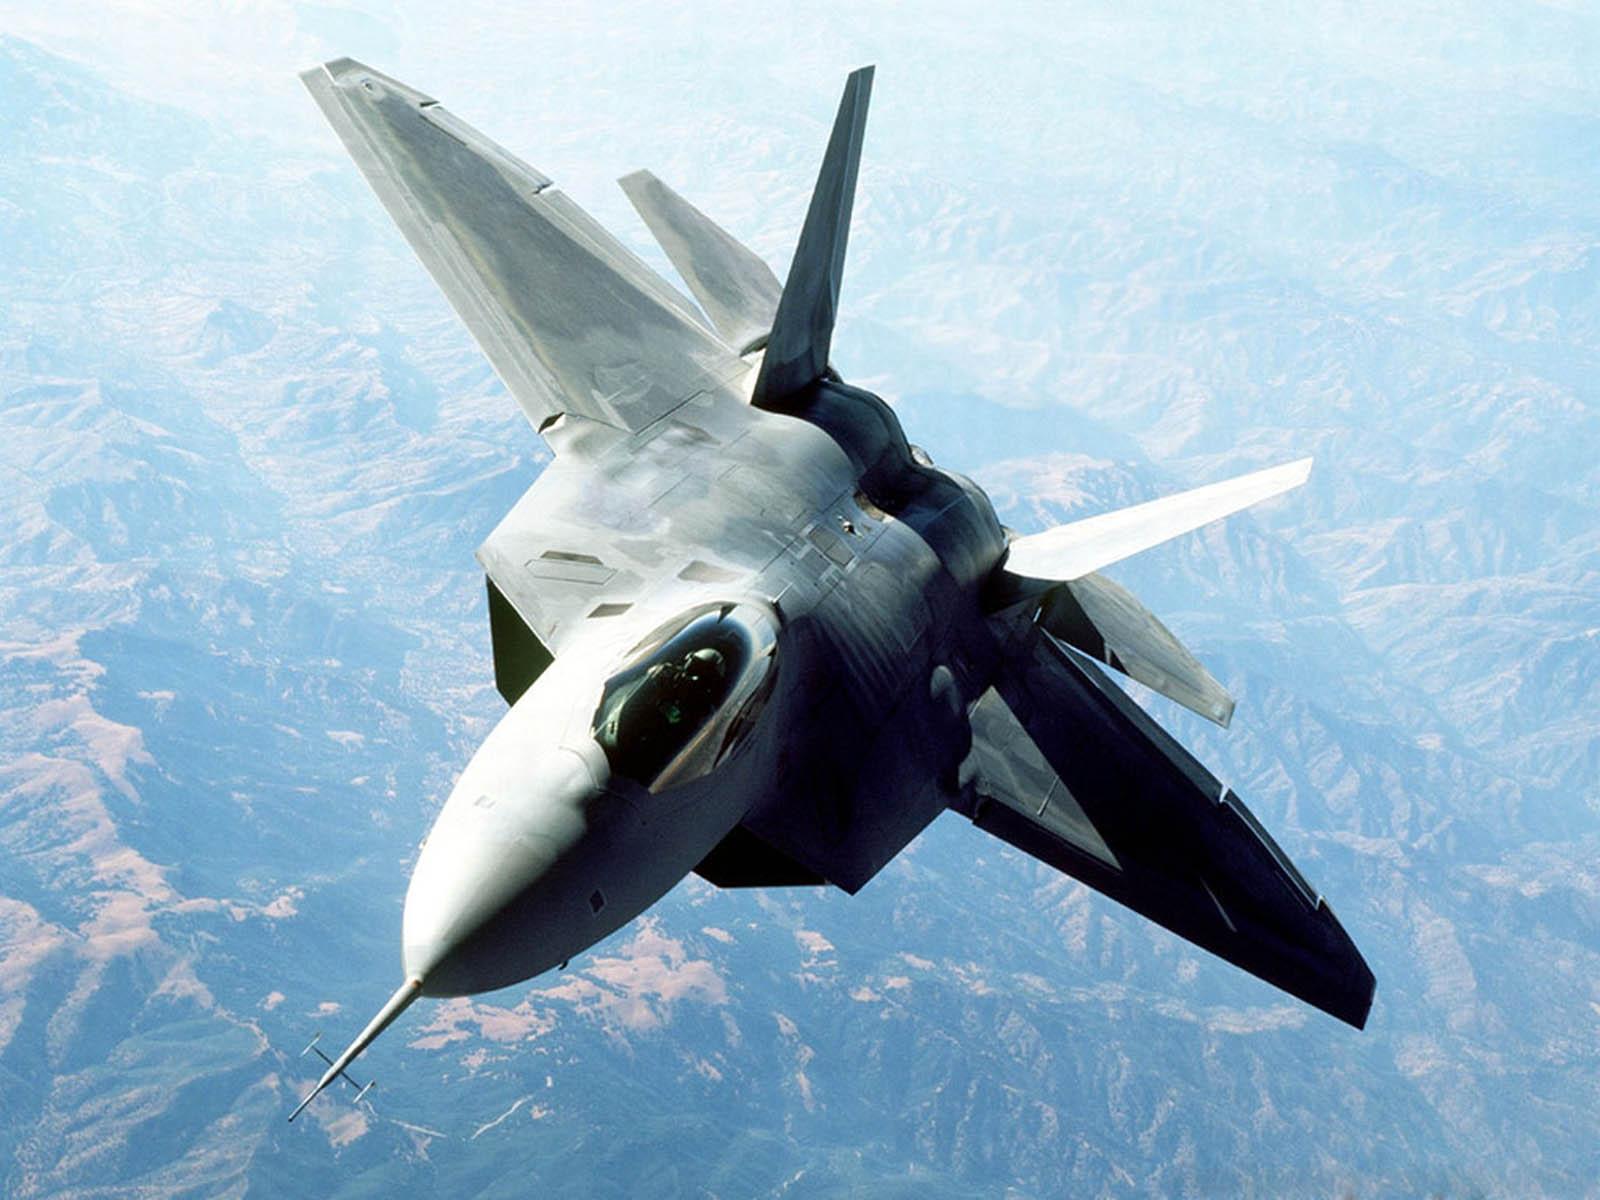 wallpaper: F 22 Raptor Military Jet Fighter Wallpapers